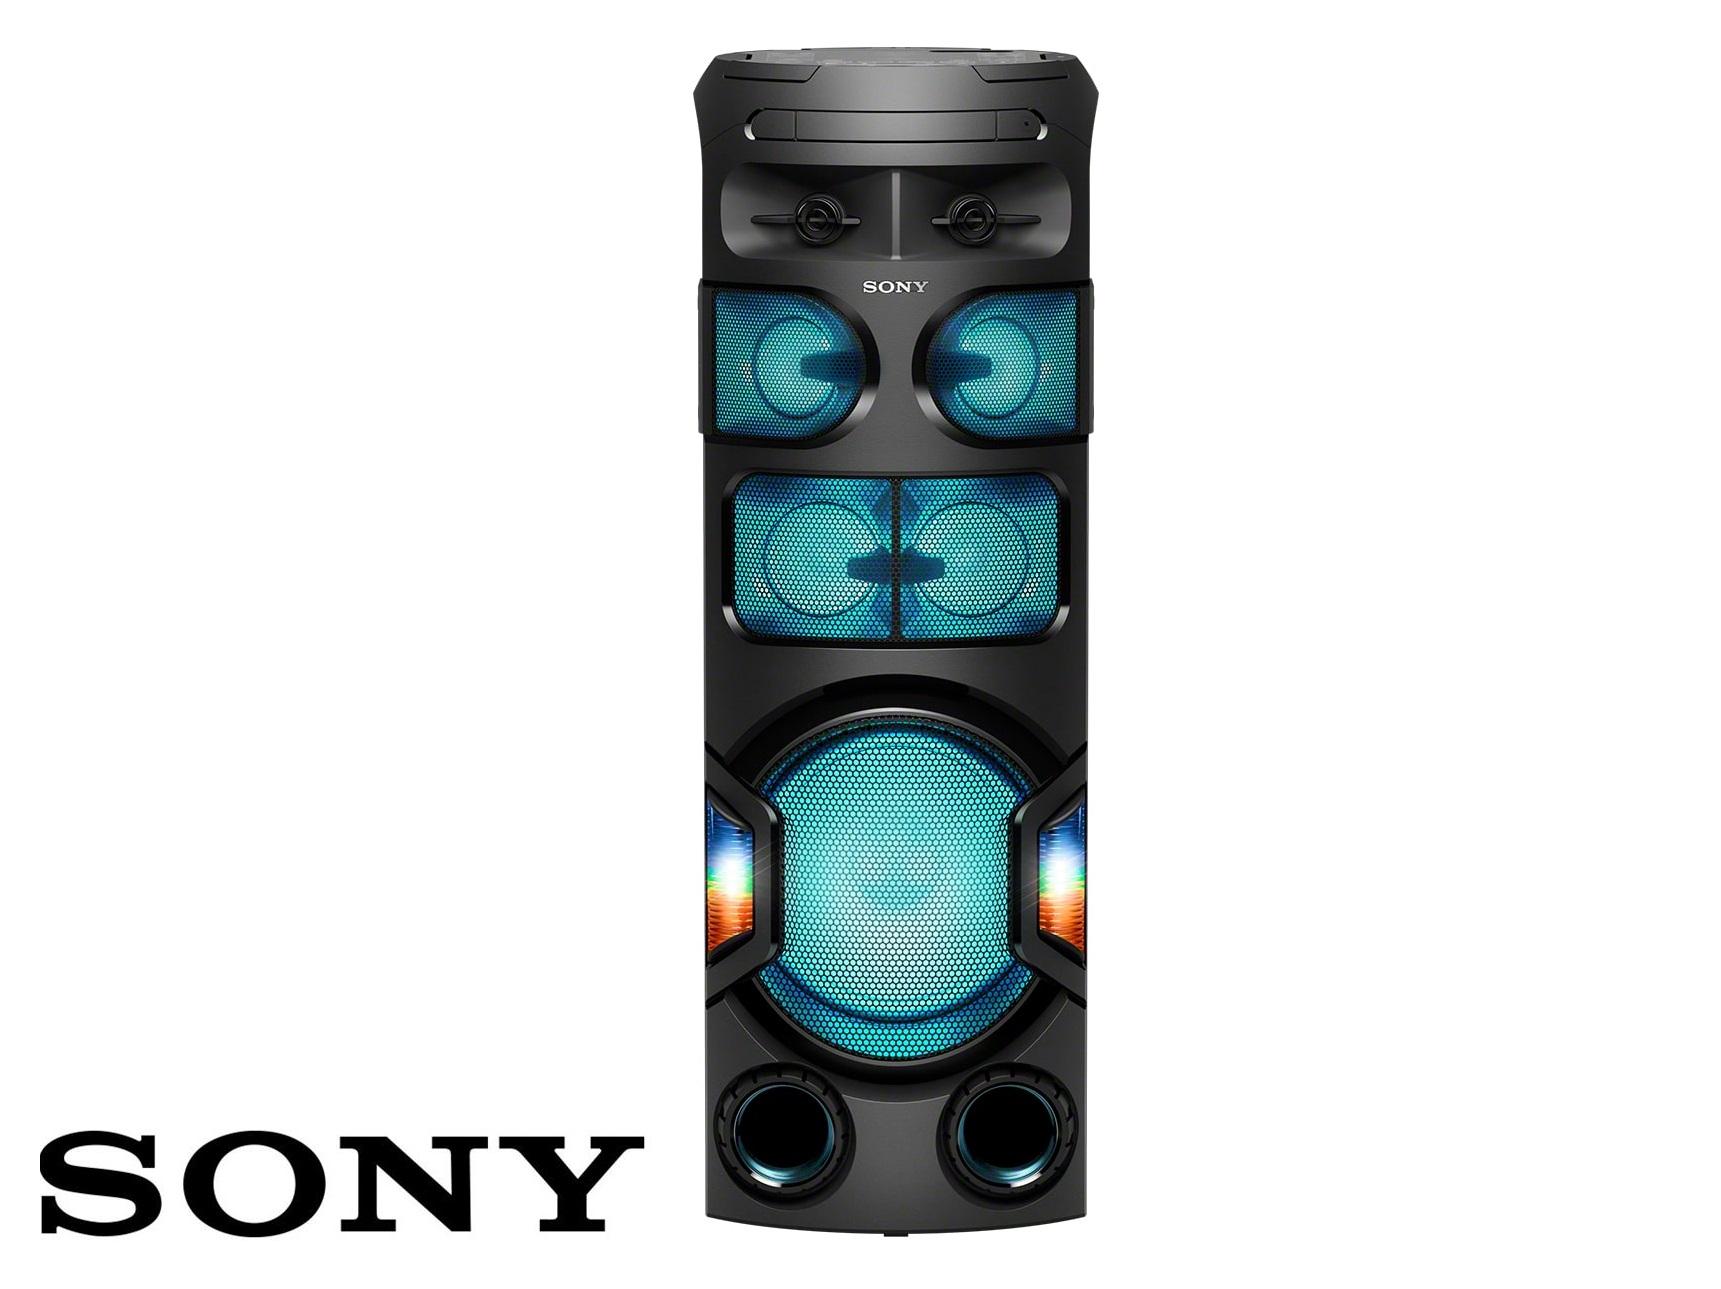 سیستم صوتی پرقدرت خانگی سونی